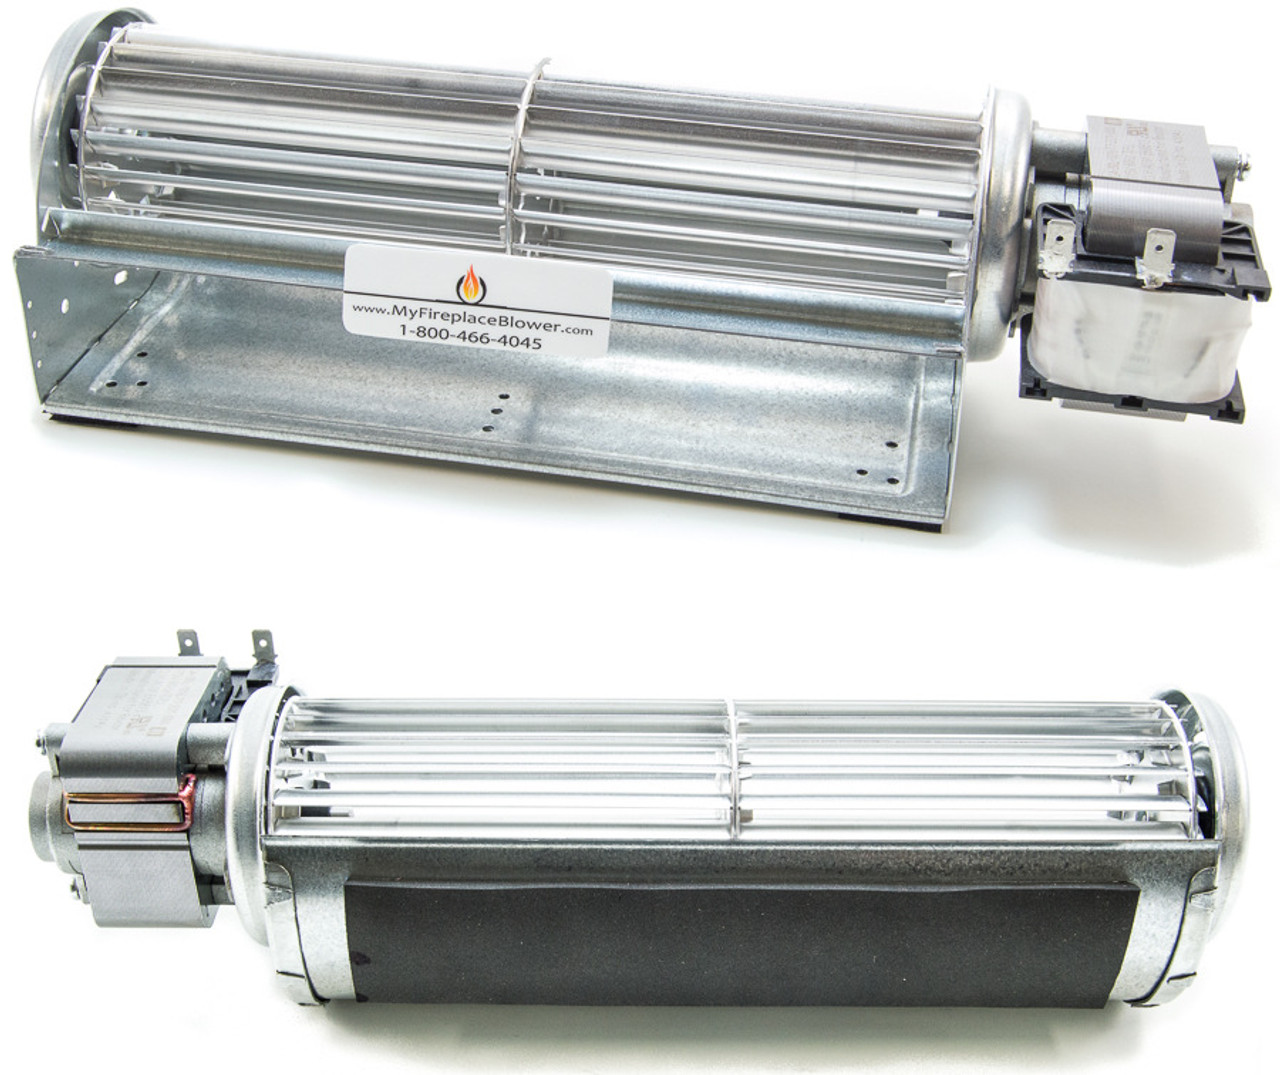 hight resolution of  gfk4b fireplace blower motor for heatilator ndv3933 ndv3933i fireplaces